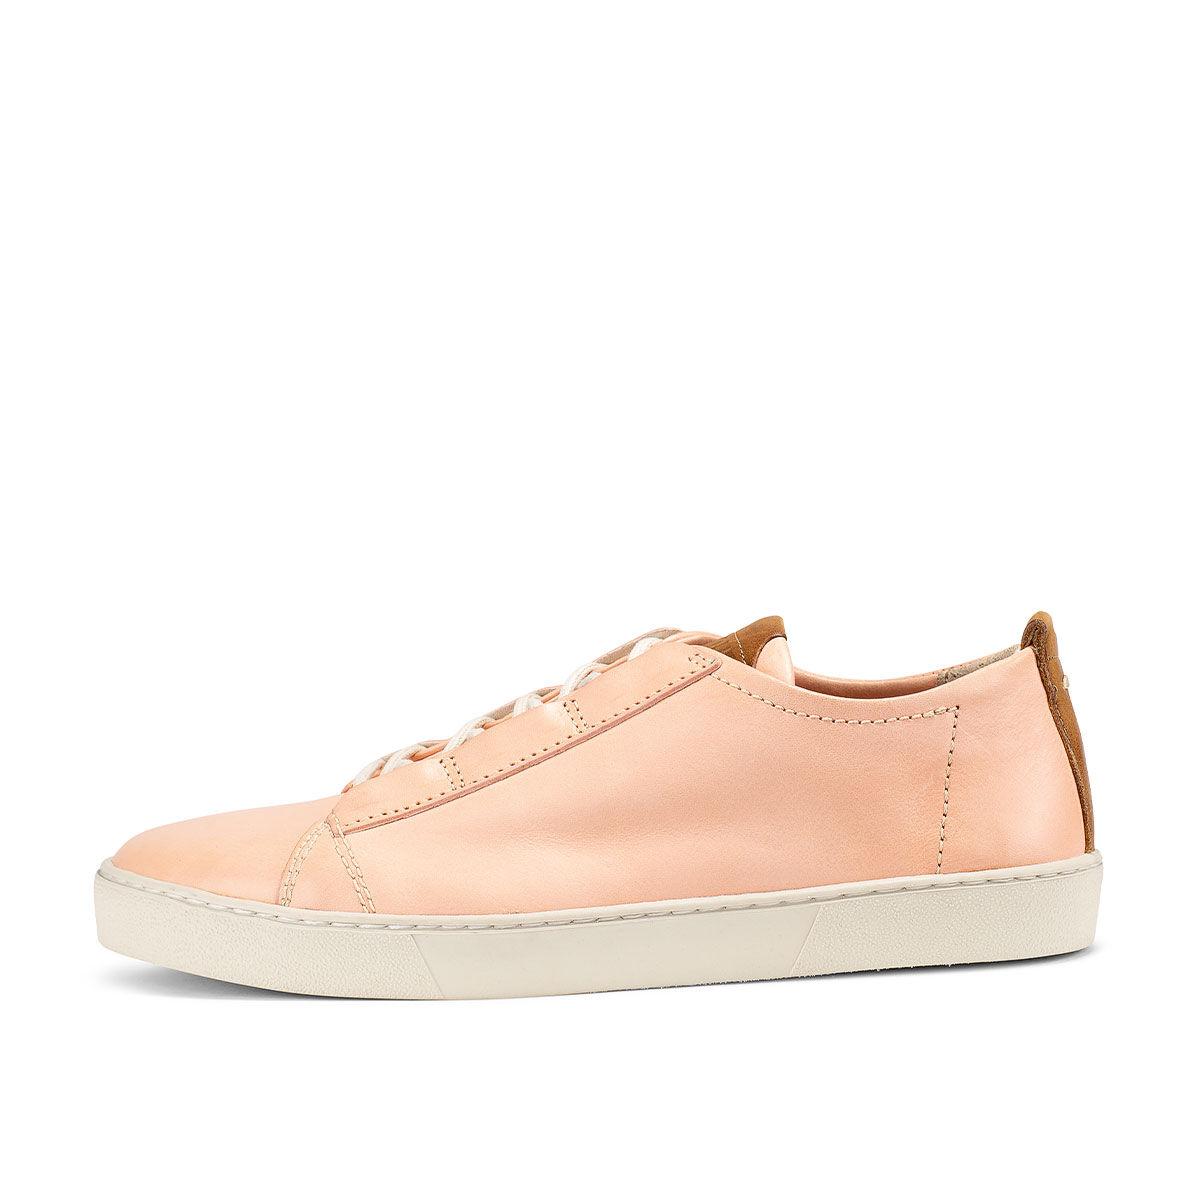 CINQUE women Sneaker CI-21951-10-40-201-36 beige